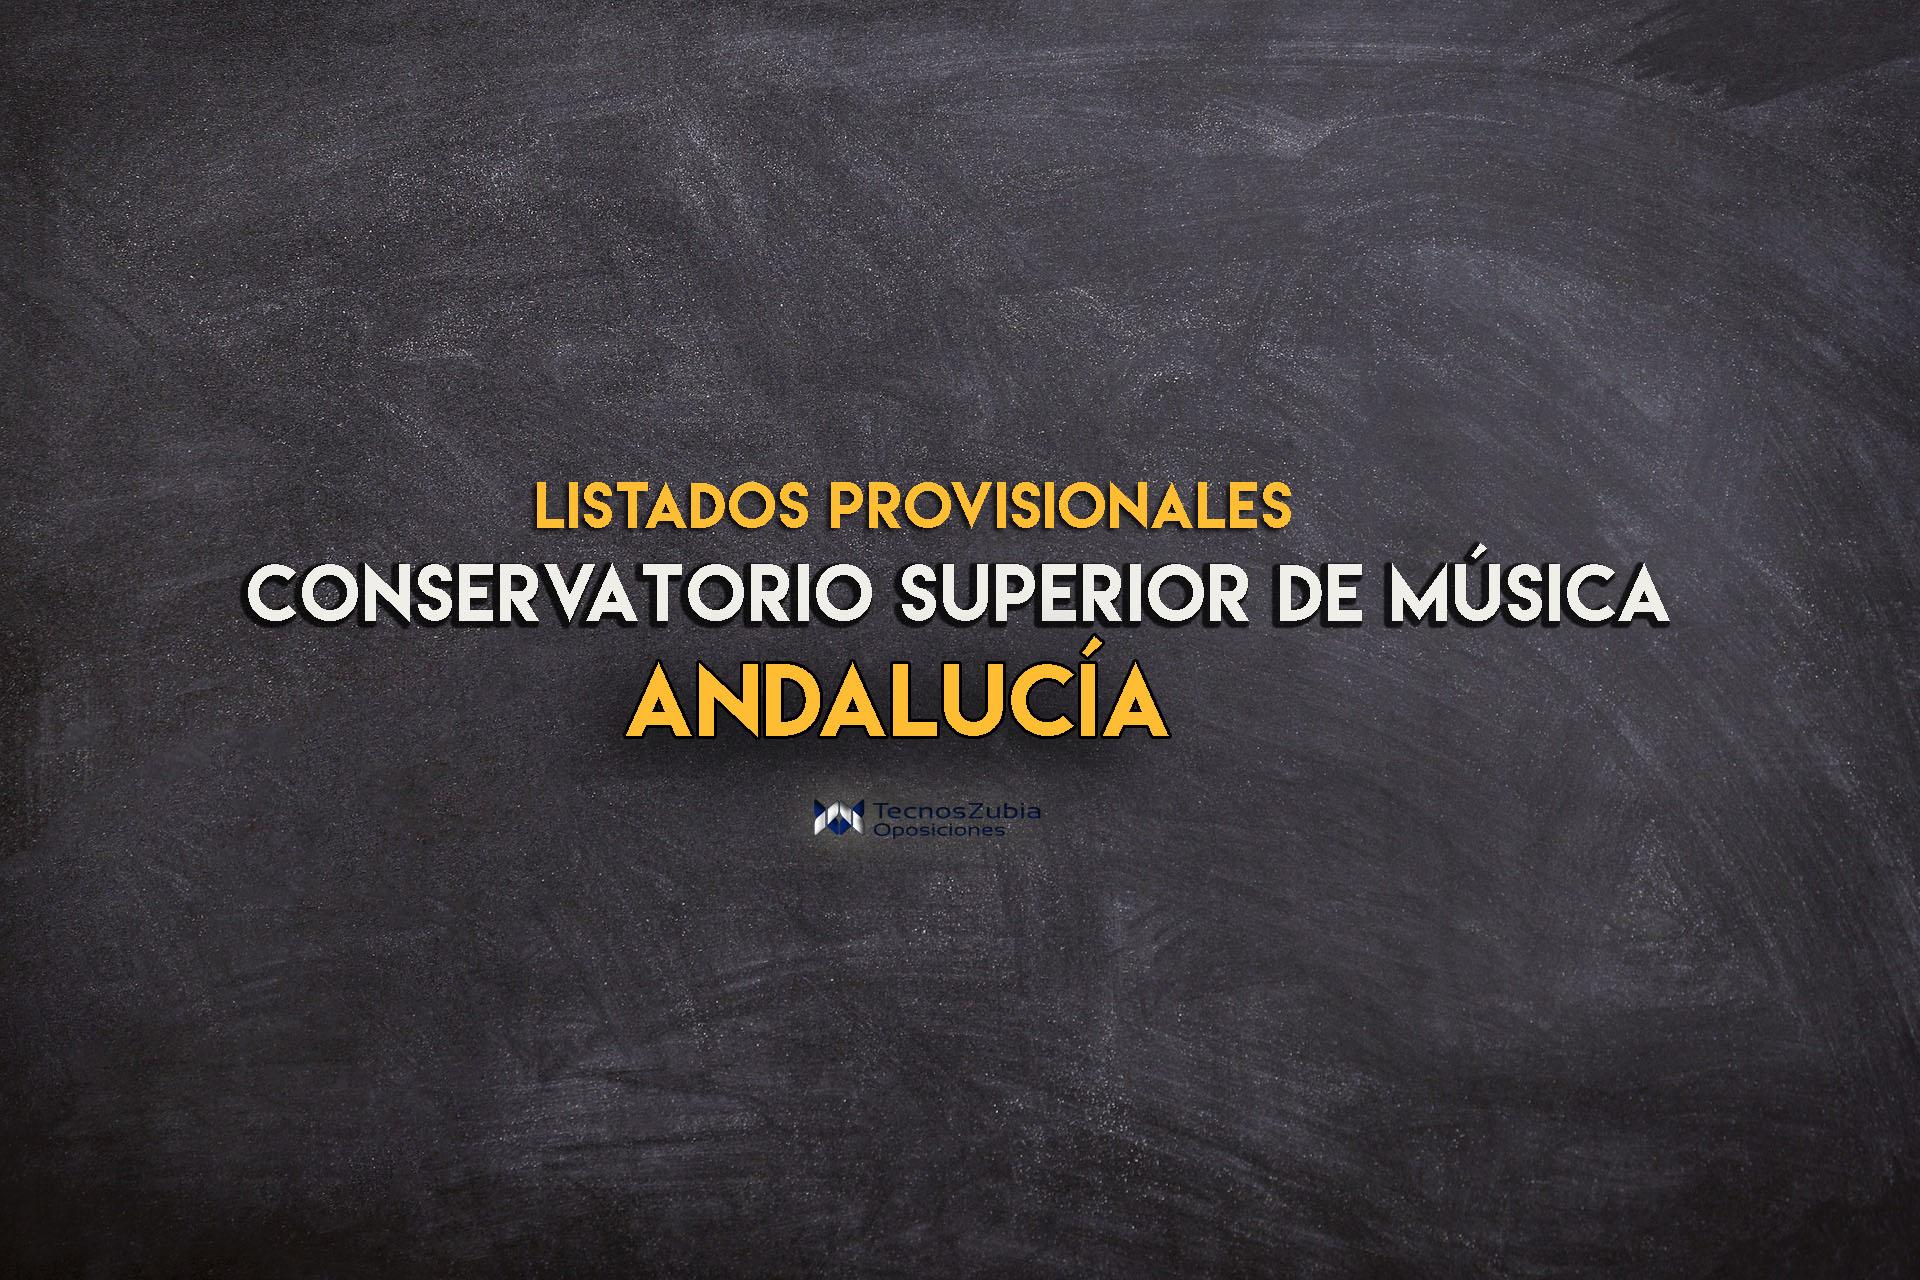 apertura de bolsas para conservatorio superior de música en Andalucia